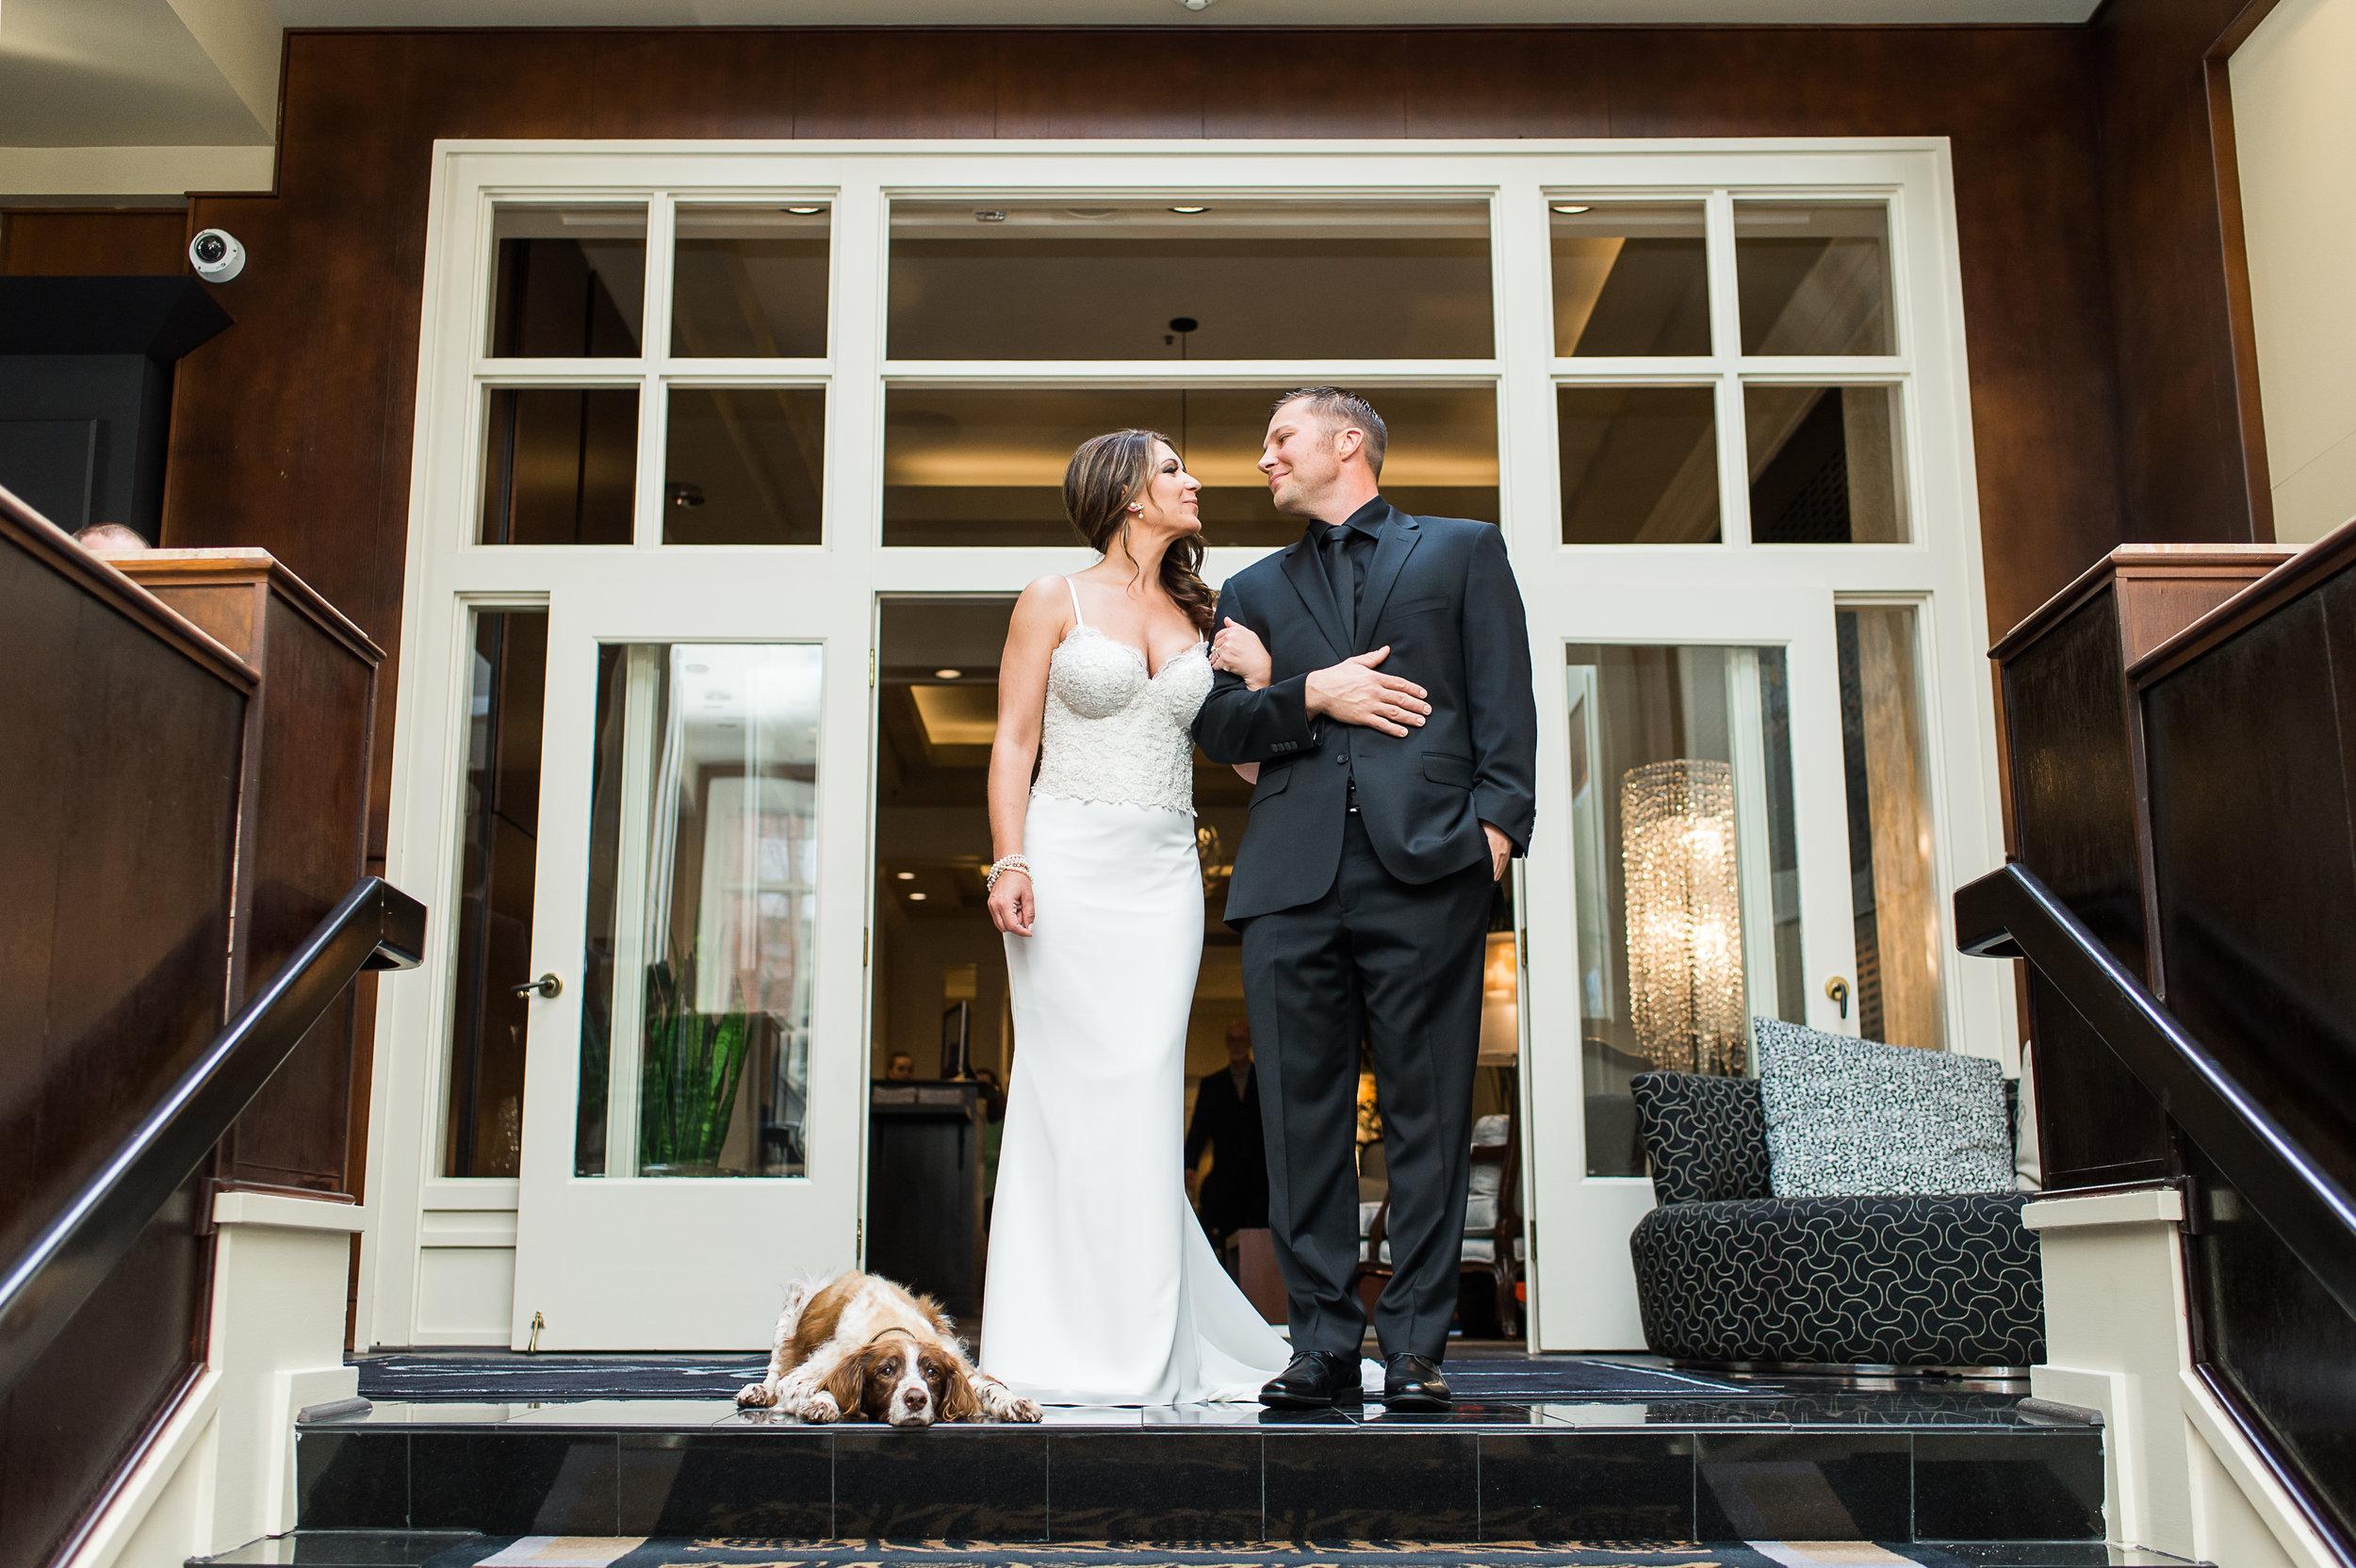 JJ-wedding-Van-Wyhe-Photography-136.jpg